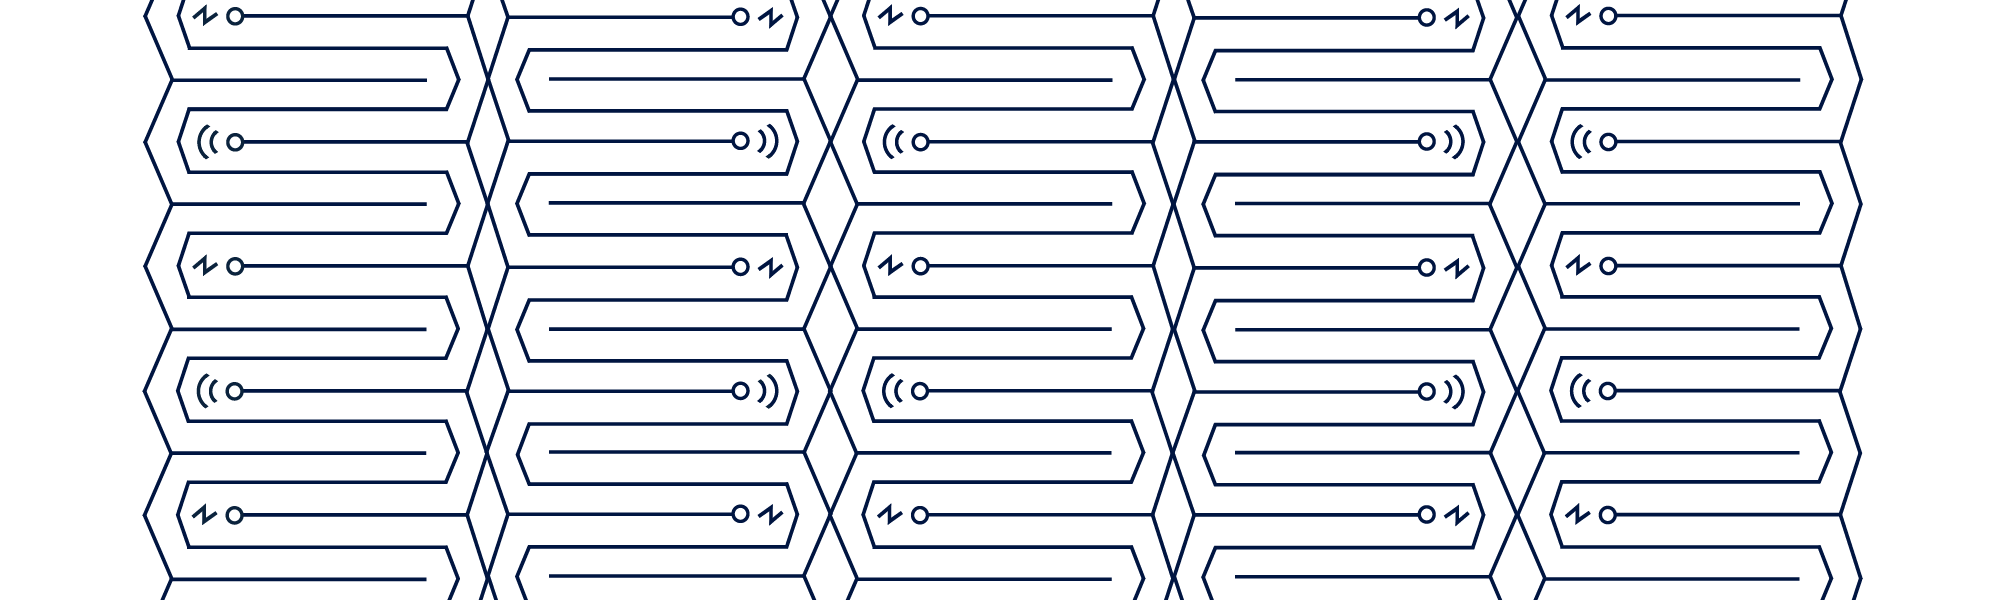 Tech Companies' Patent Application pattern